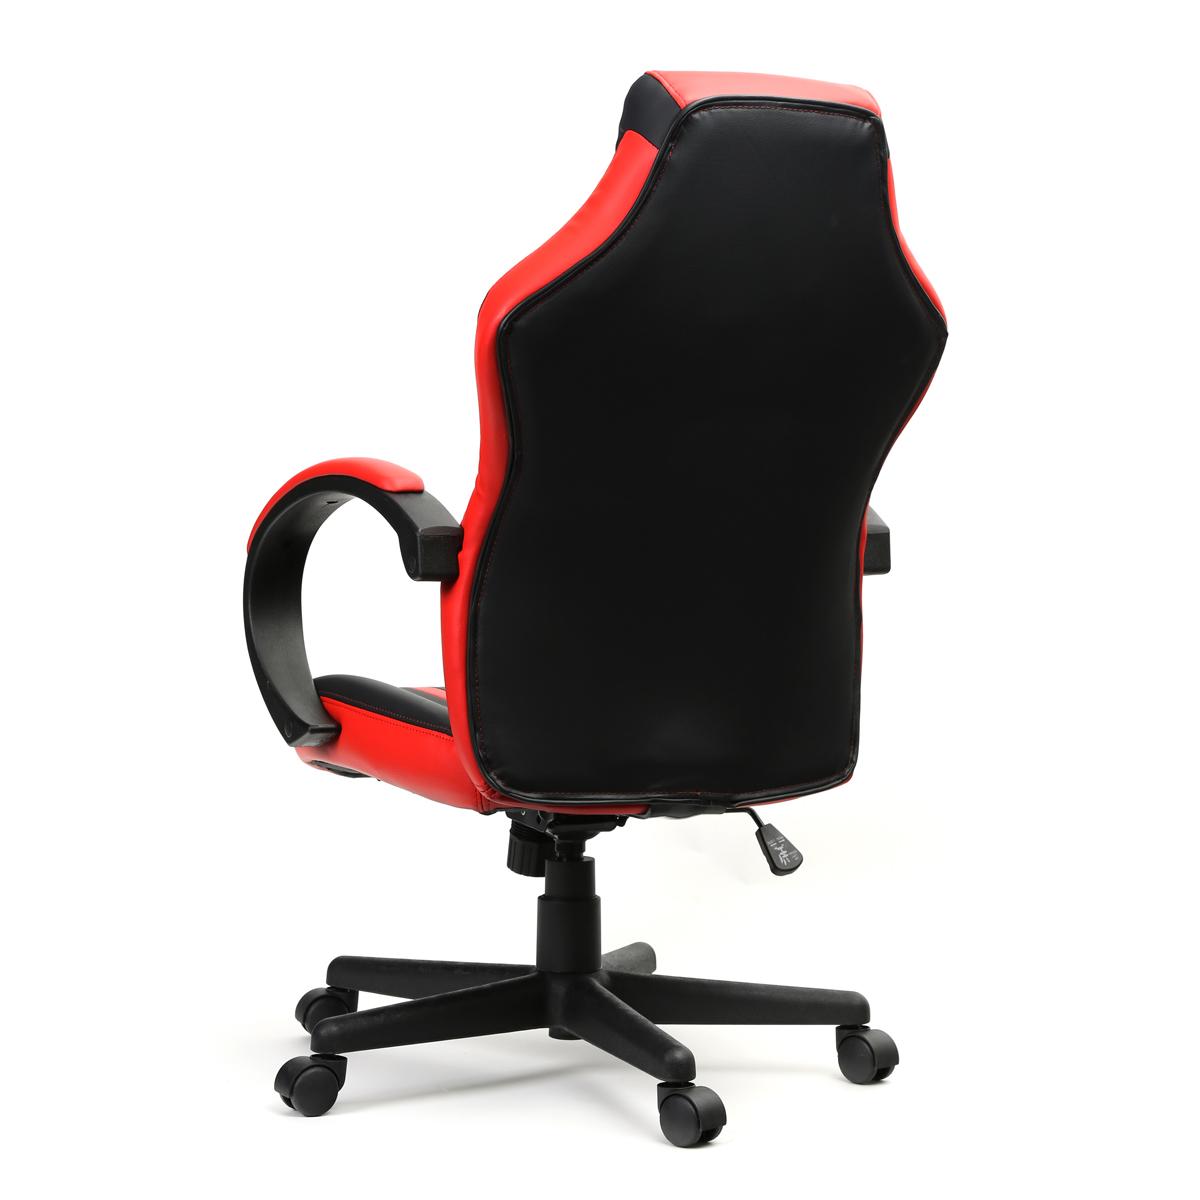 VARR gaming chair SLIDE, zwart met rood - PU + PVC, 5x 5cm nylon wielen, tilt lock, 15 graden, 13,5 kg